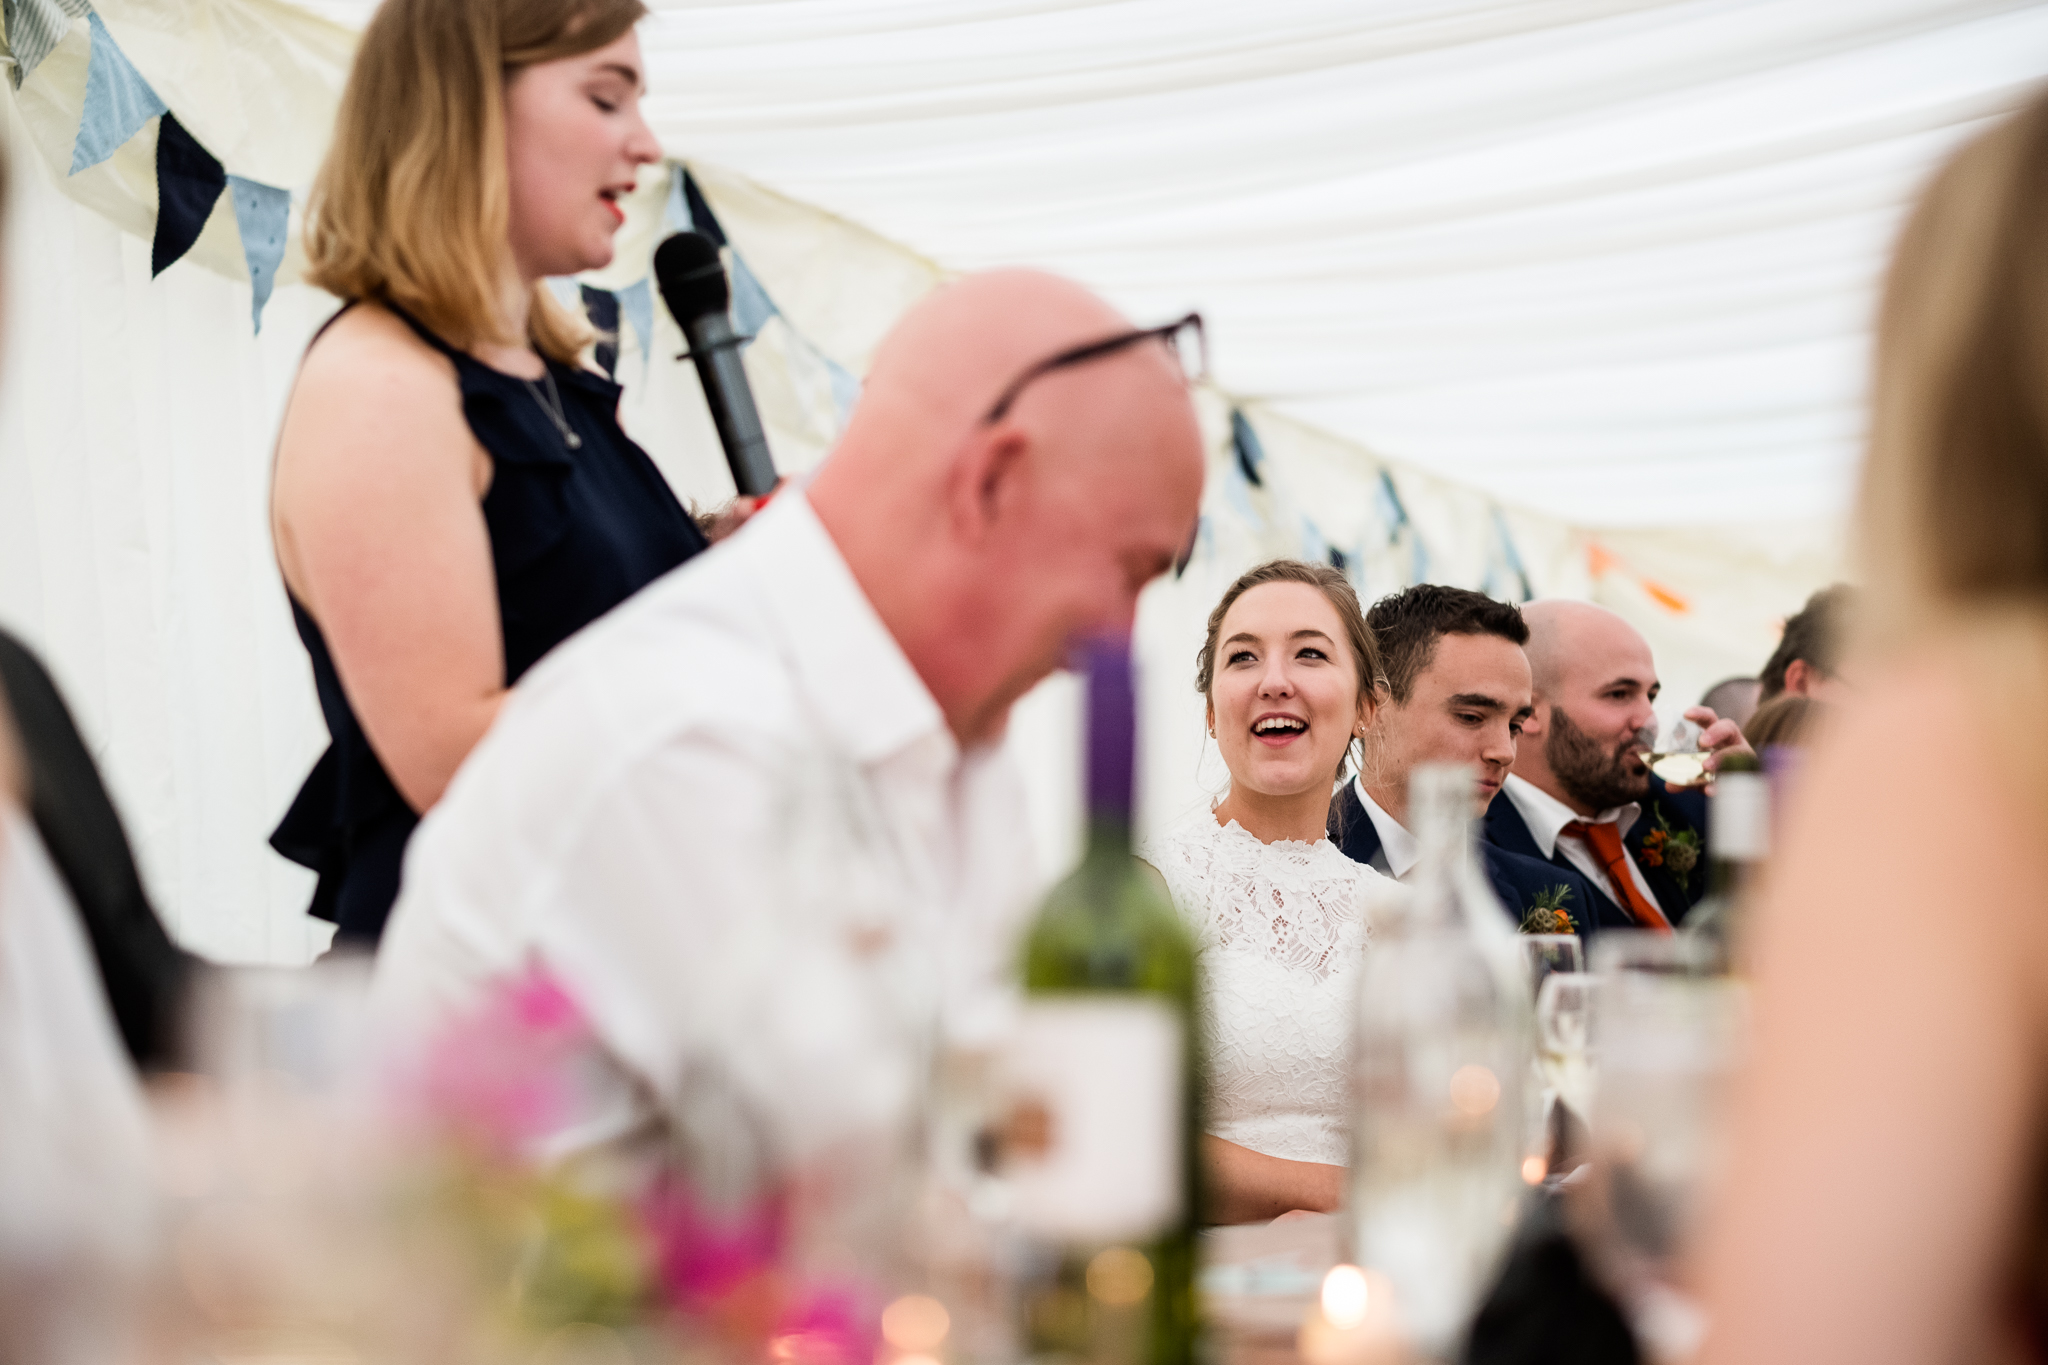 Relaxed Documentary Wedding Photography at The Wizard Inn, Alderley Edge Cheshire - Jenny Harper-64.jpg